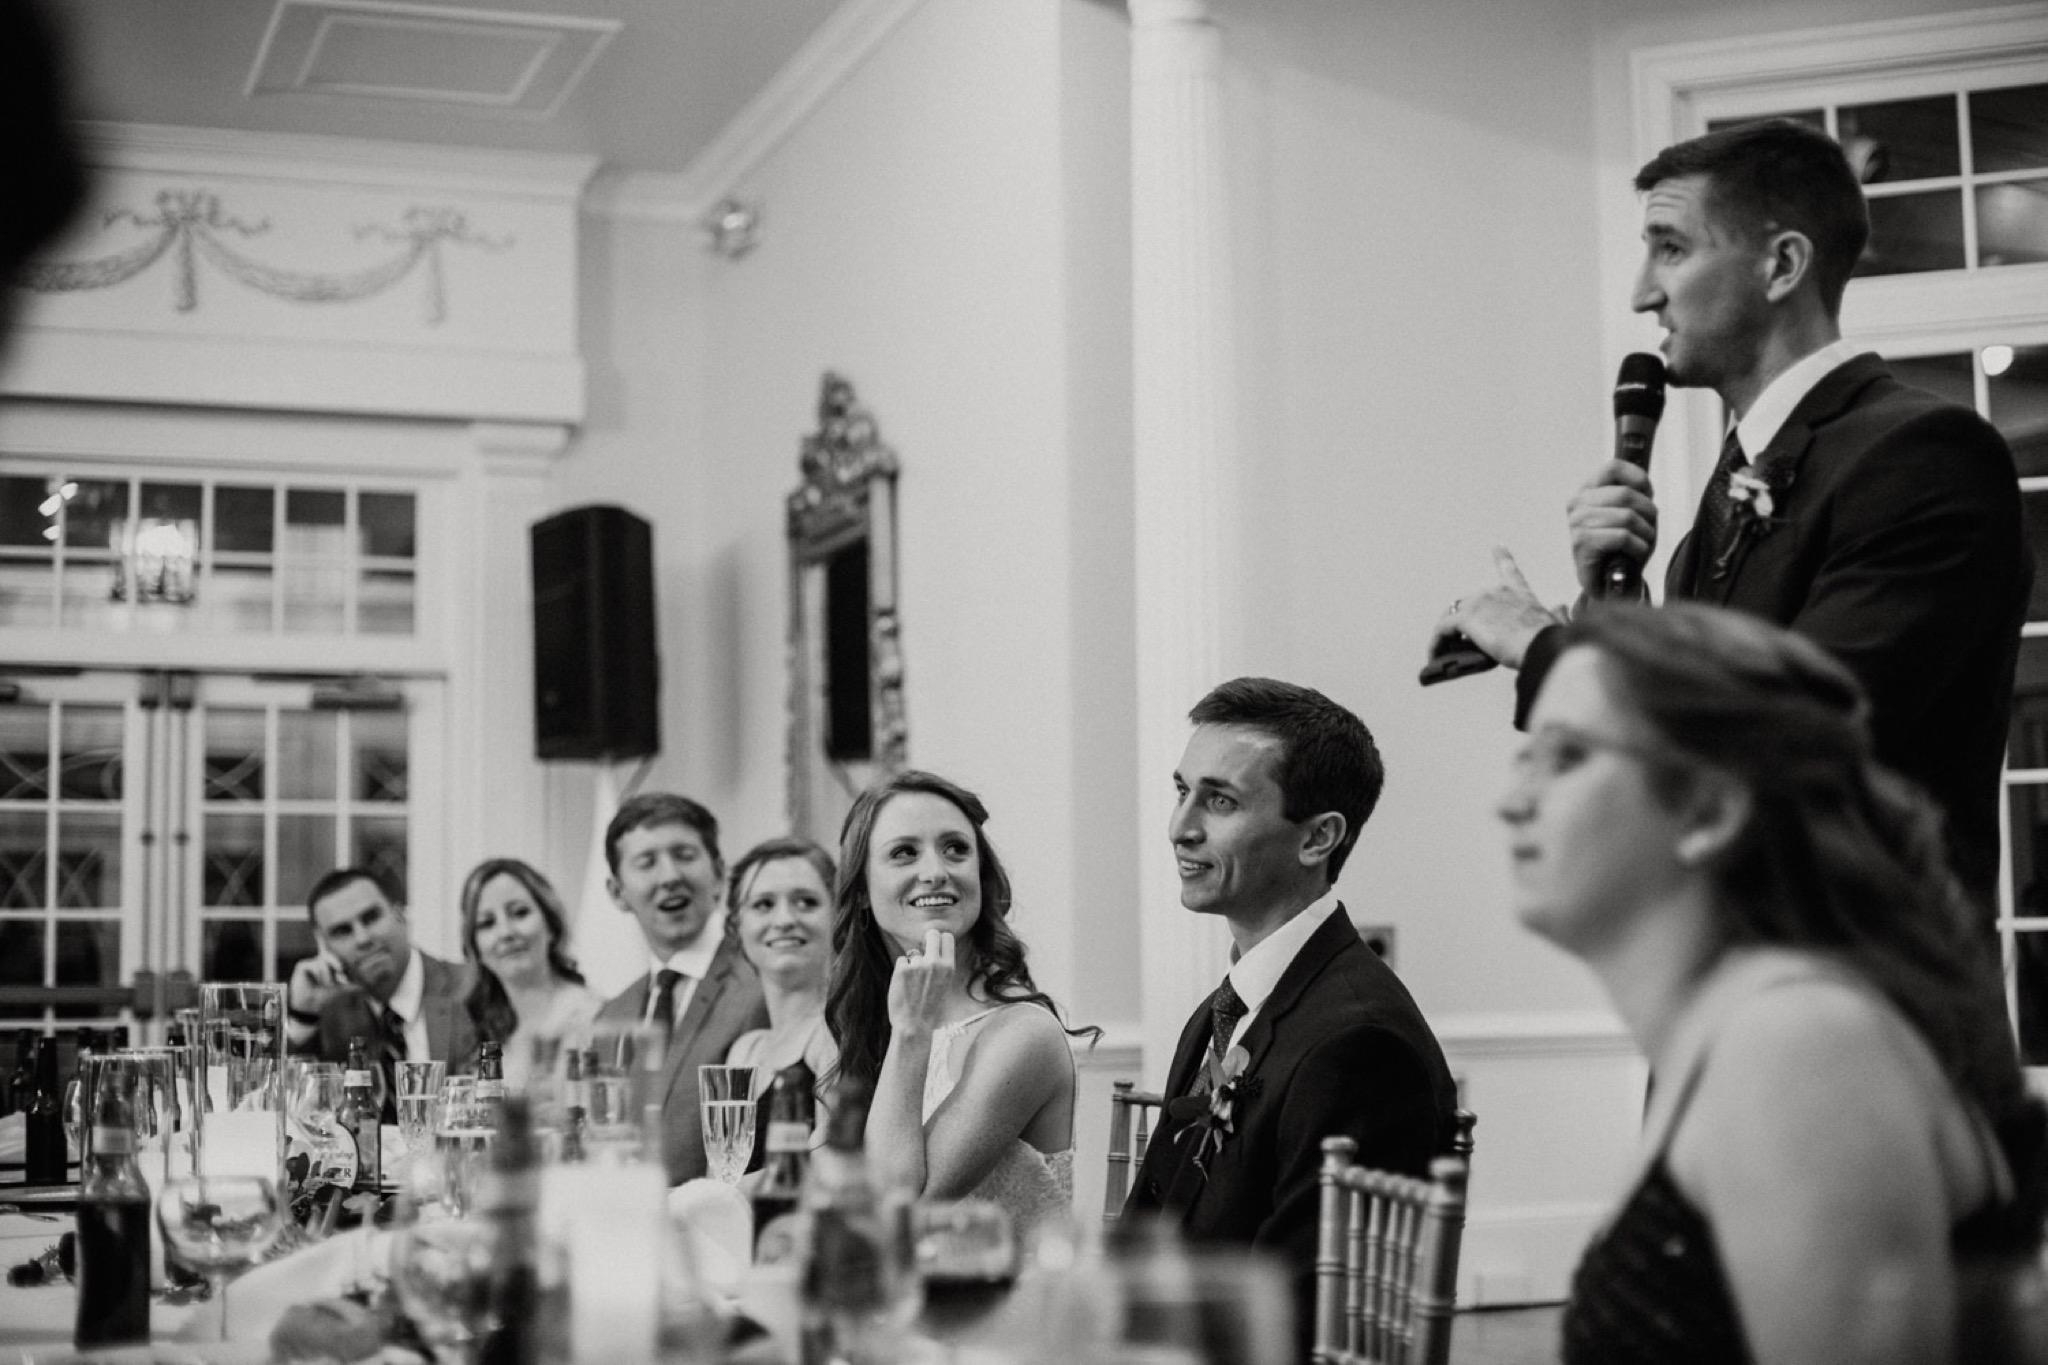 82_West Manor Estate Weddings - Pat Cori Photography-179_VirginiaWeddingPhotographer_toasts_WestManorEstate_Weddingvenue_Wedding.jpg